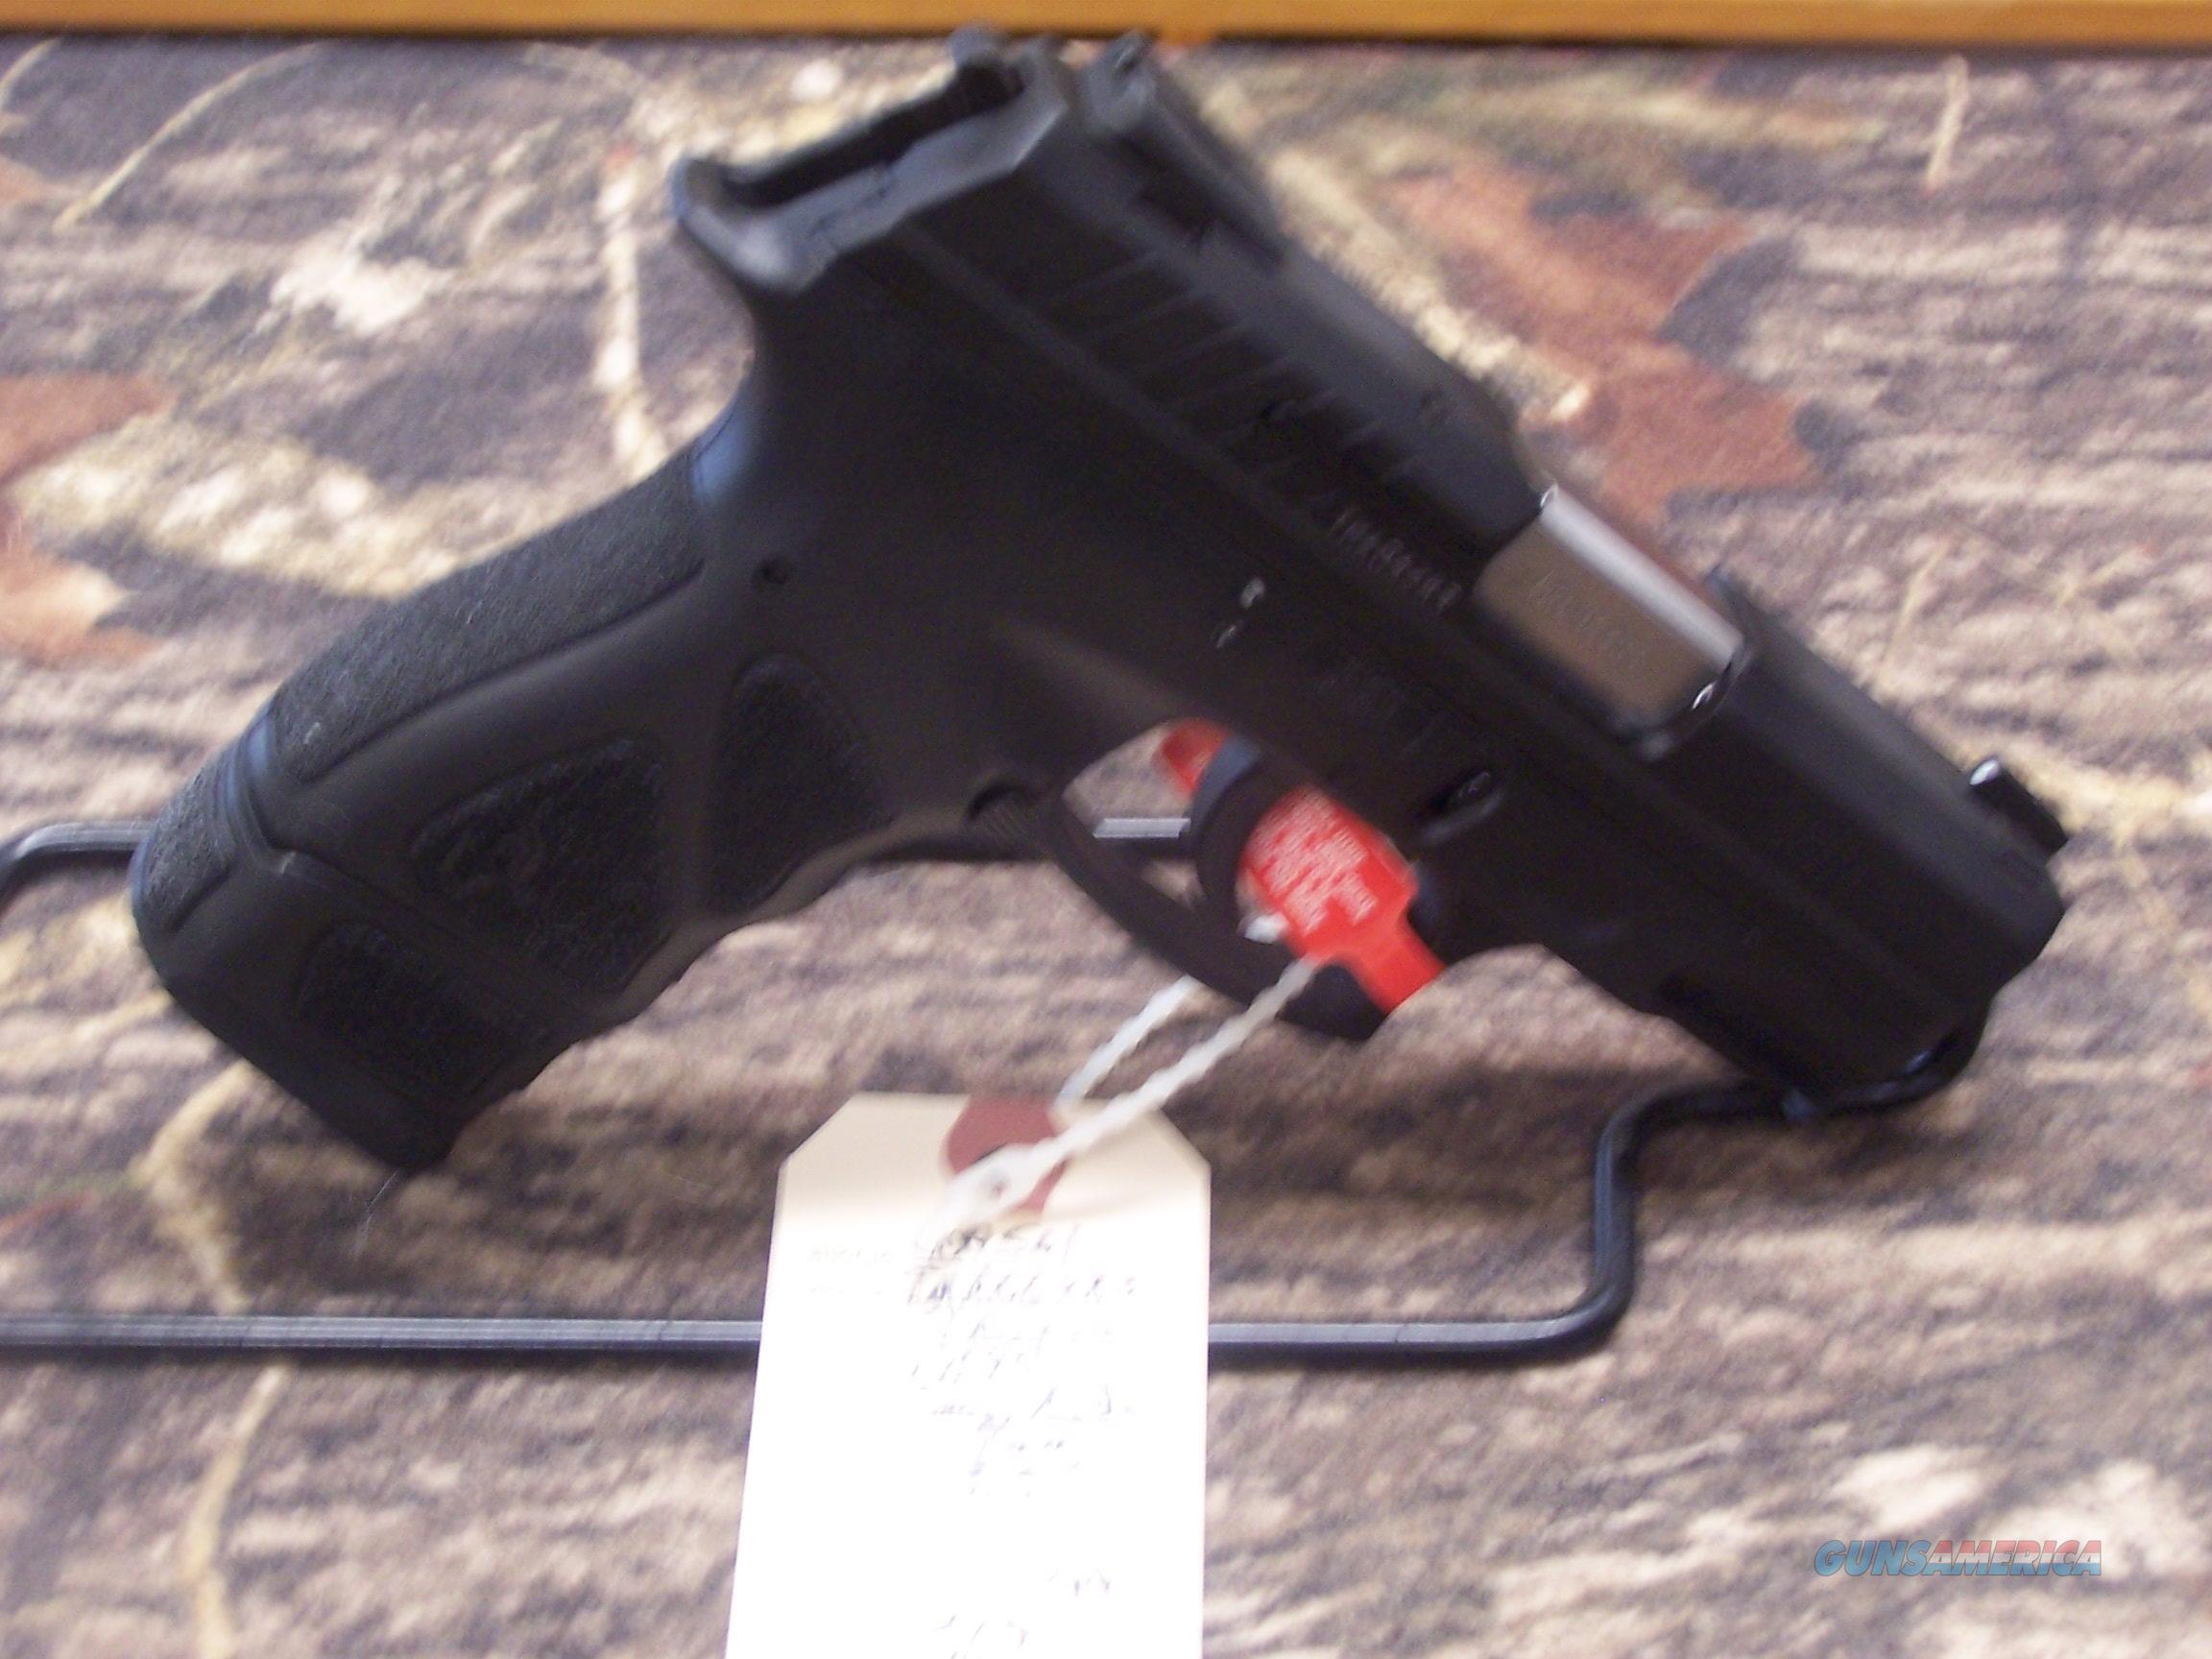 "Taurus TH9C 9mm 3.54"" Hammer Fired Pistol, Black. NIB !!!  Guns > Pistols > Taurus Pistols > Semi Auto Pistols > Polymer Frame"